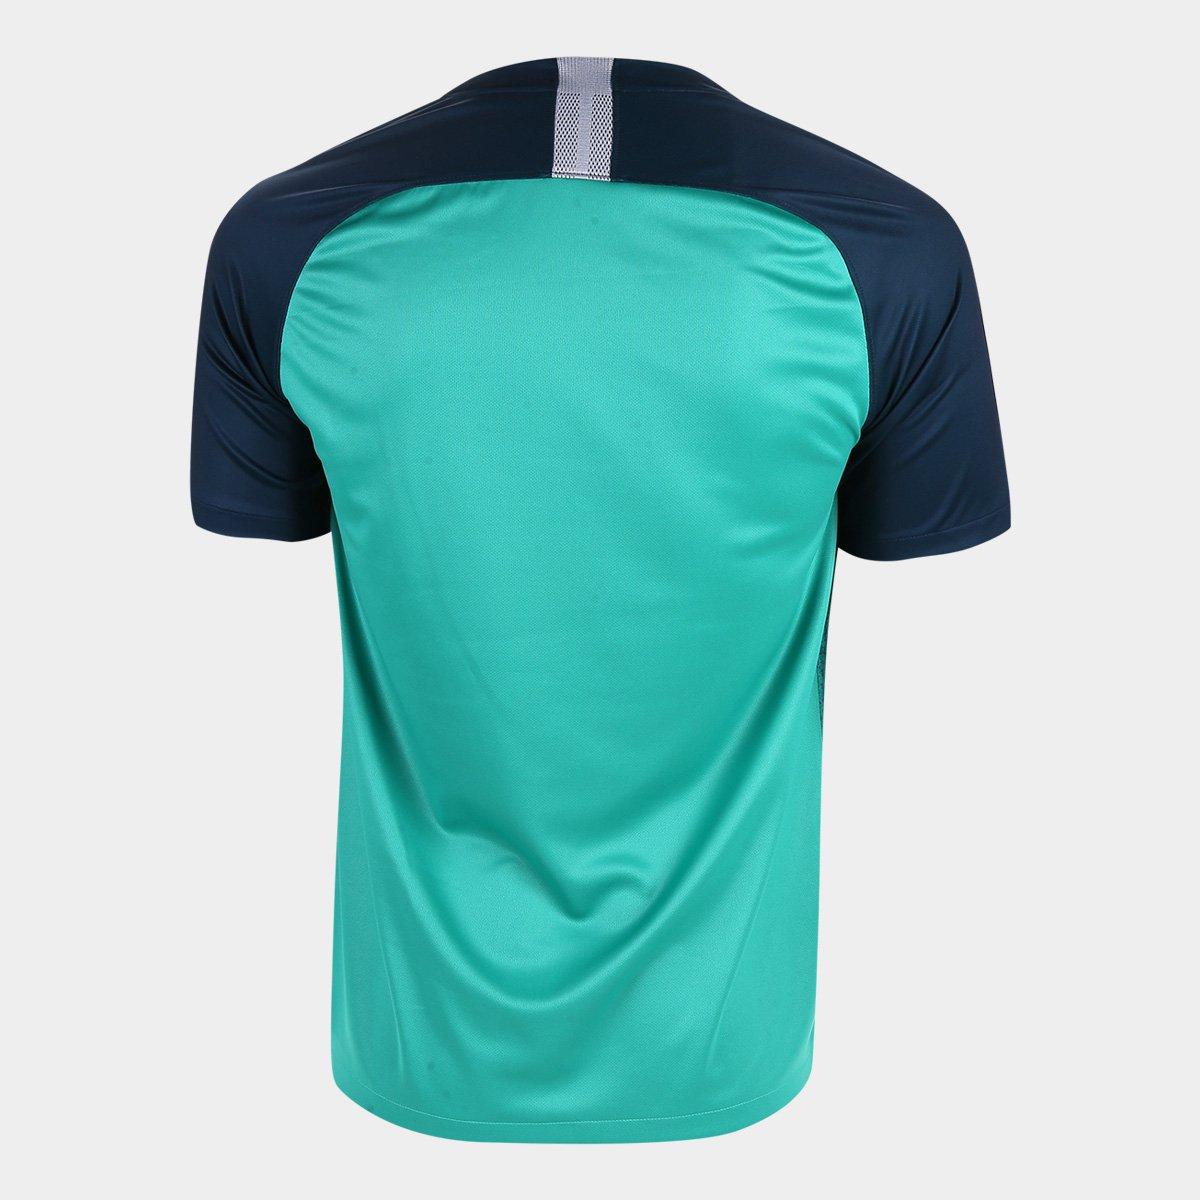 ca633caadc Camisa Tottenham Third 2018 s n° - Torcedor Nike Masculina - Verde ...